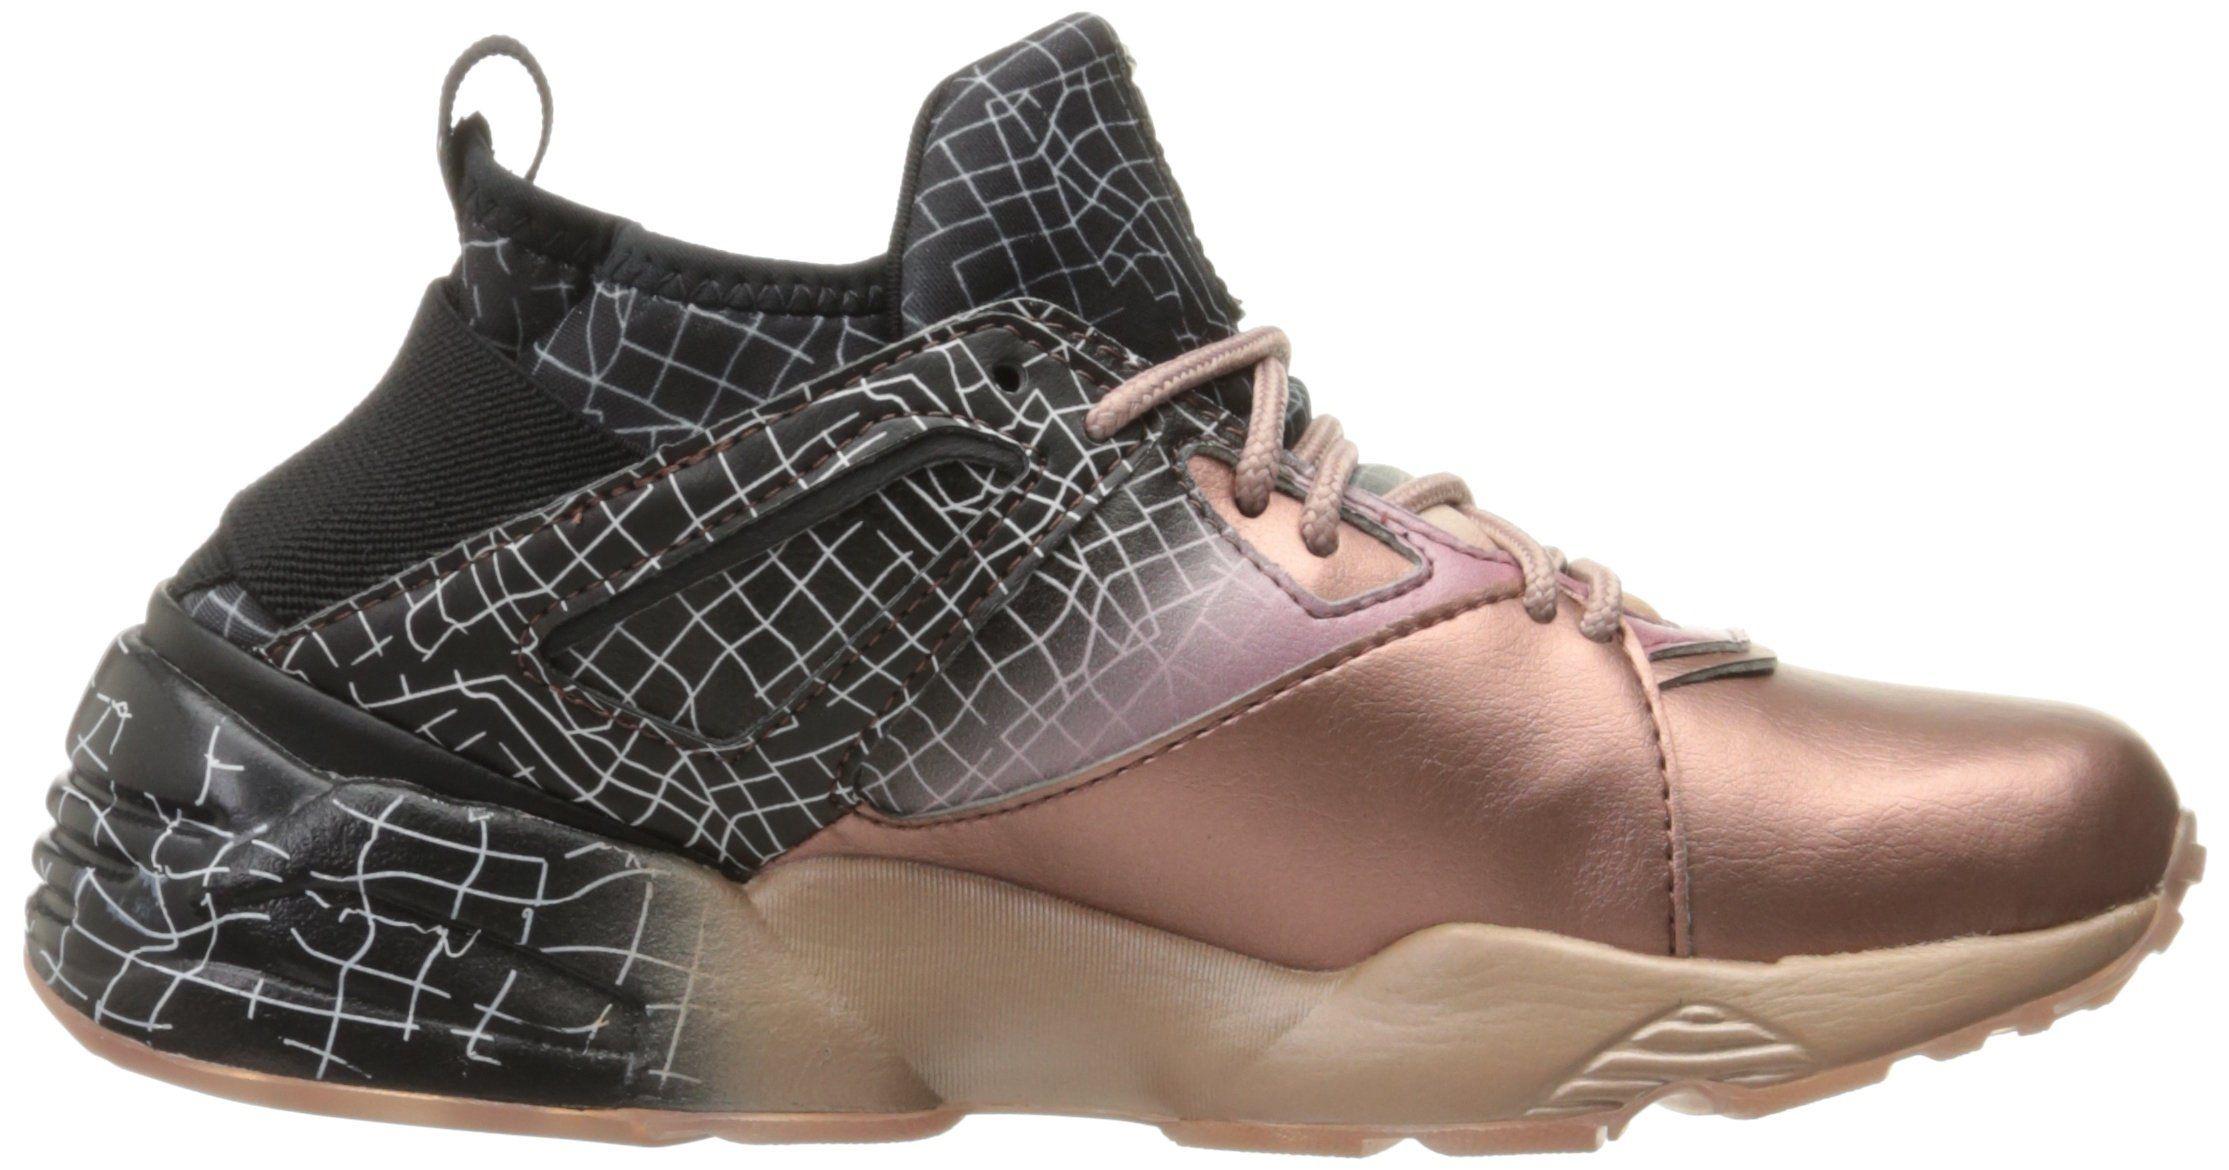 5feecc8334c PUMA Womens B.O.G Sock RG Wns CrossTrainer Shoe Rose Gold Black 9 M US  gt